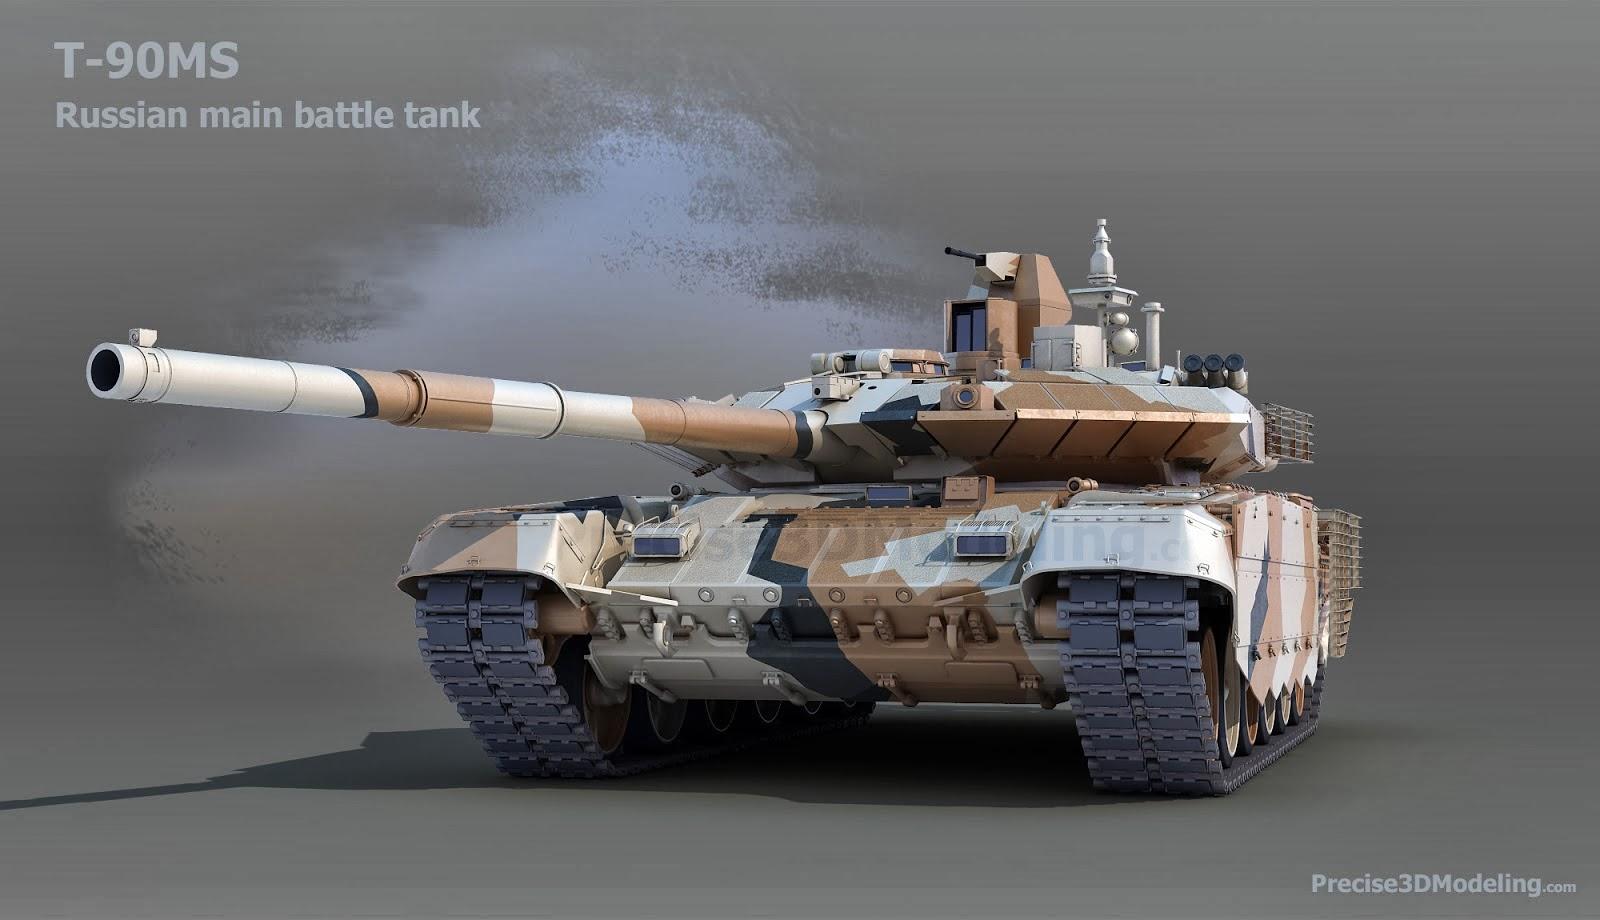 T-90MS_03_large.jpg